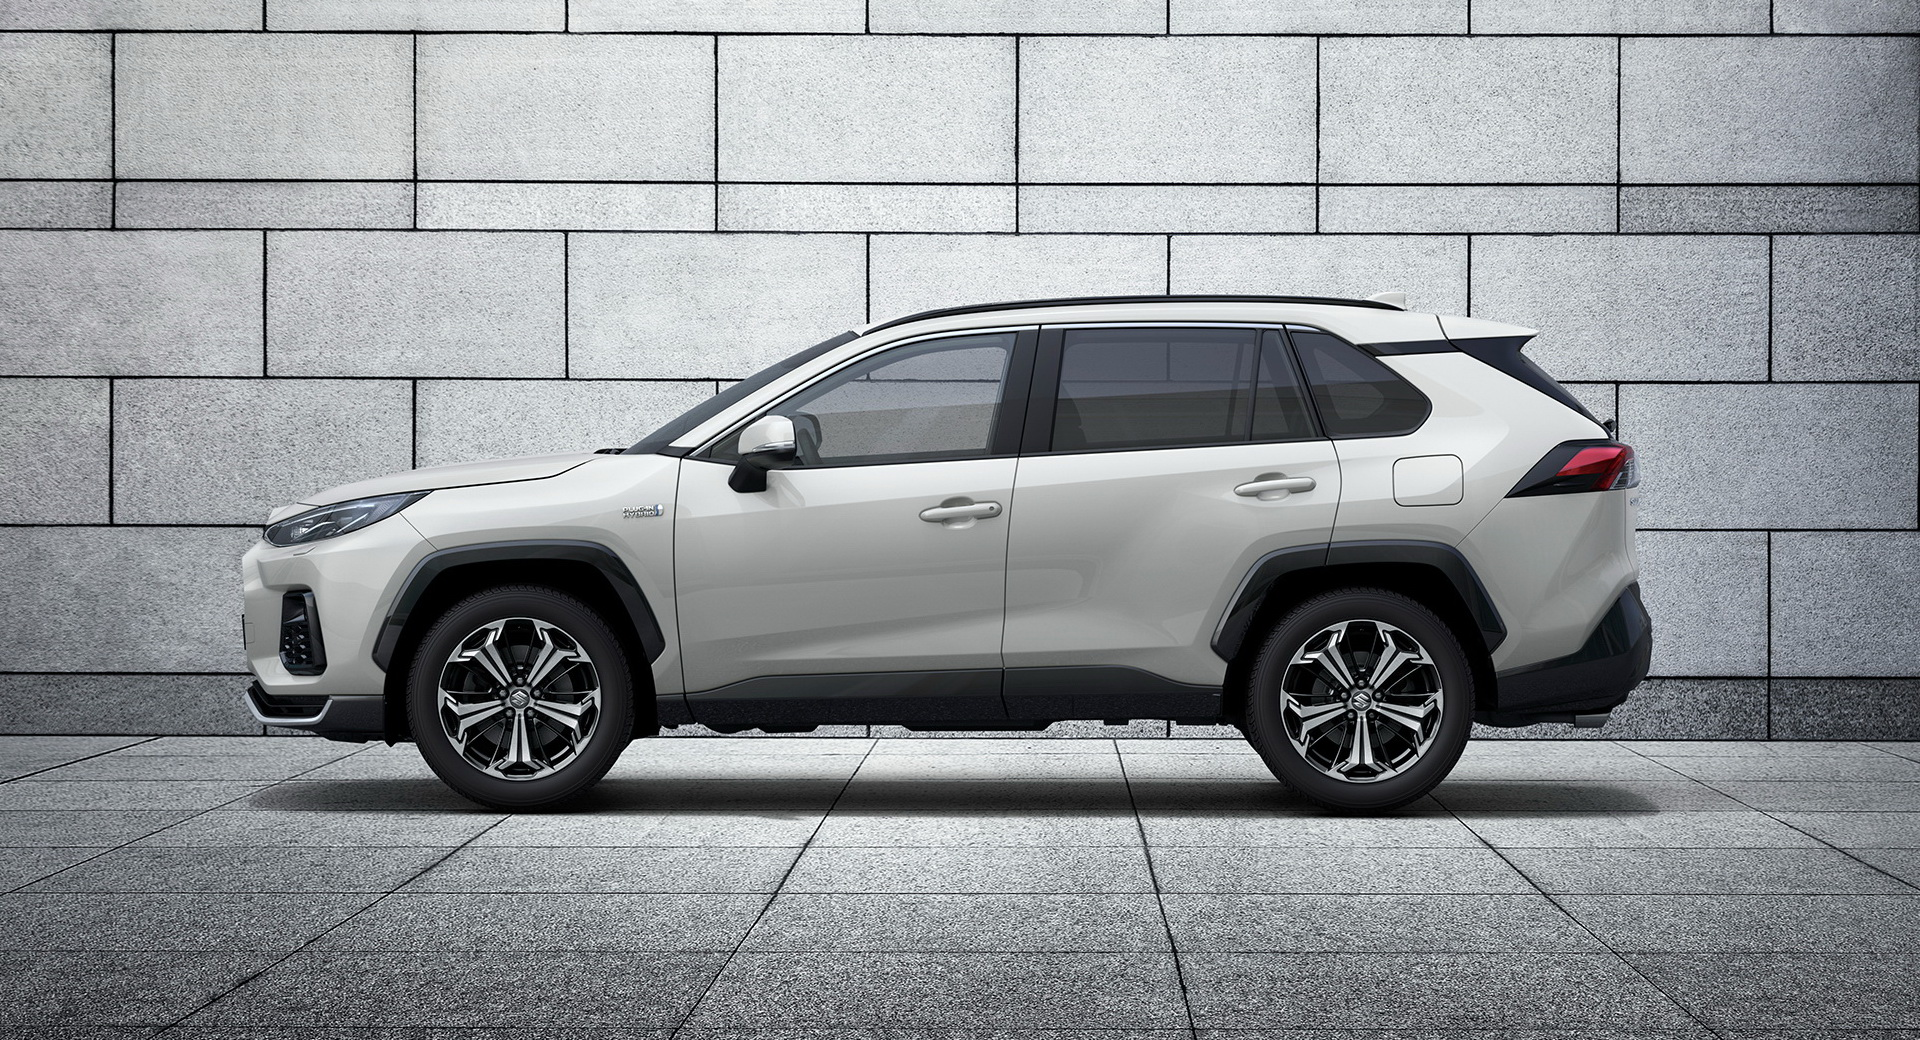 2021-Suzuki-Across-03.jpg